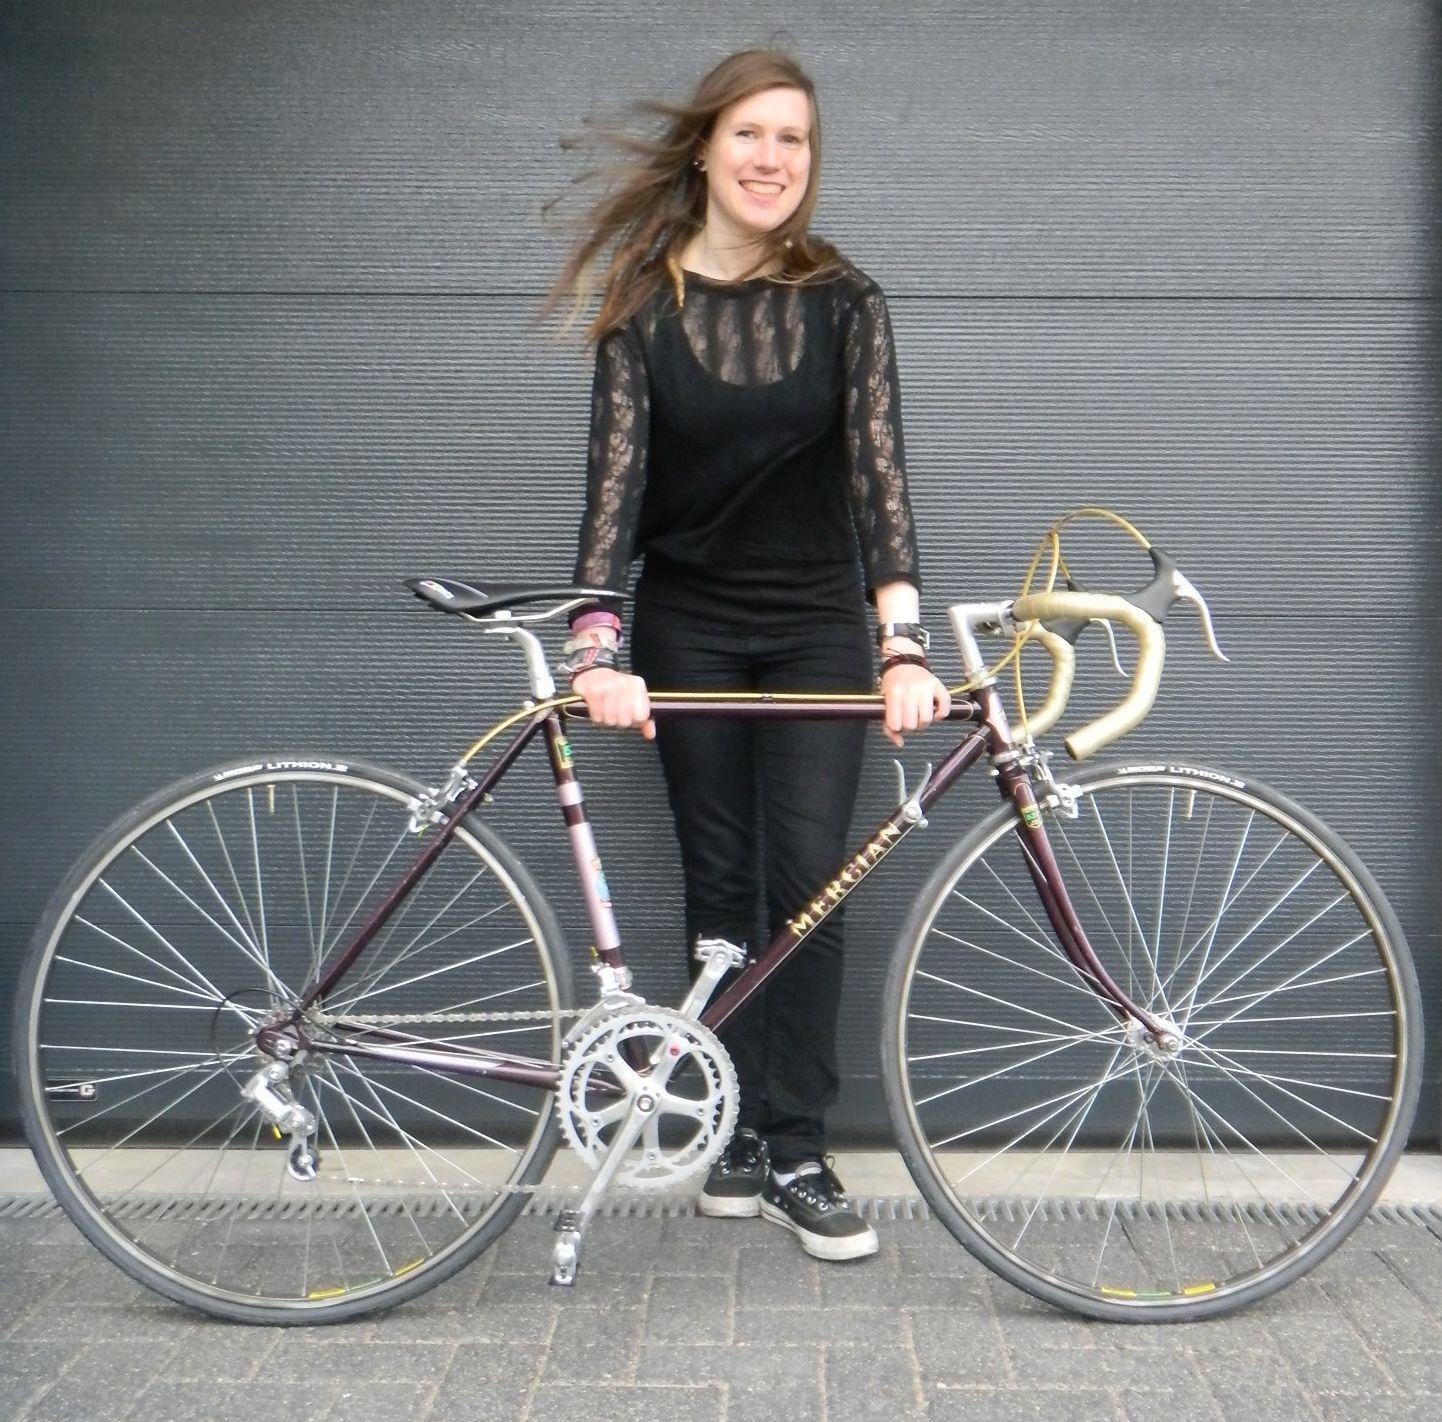 Single bremen kostenlos | Jacobs University - Inspiration is a Place